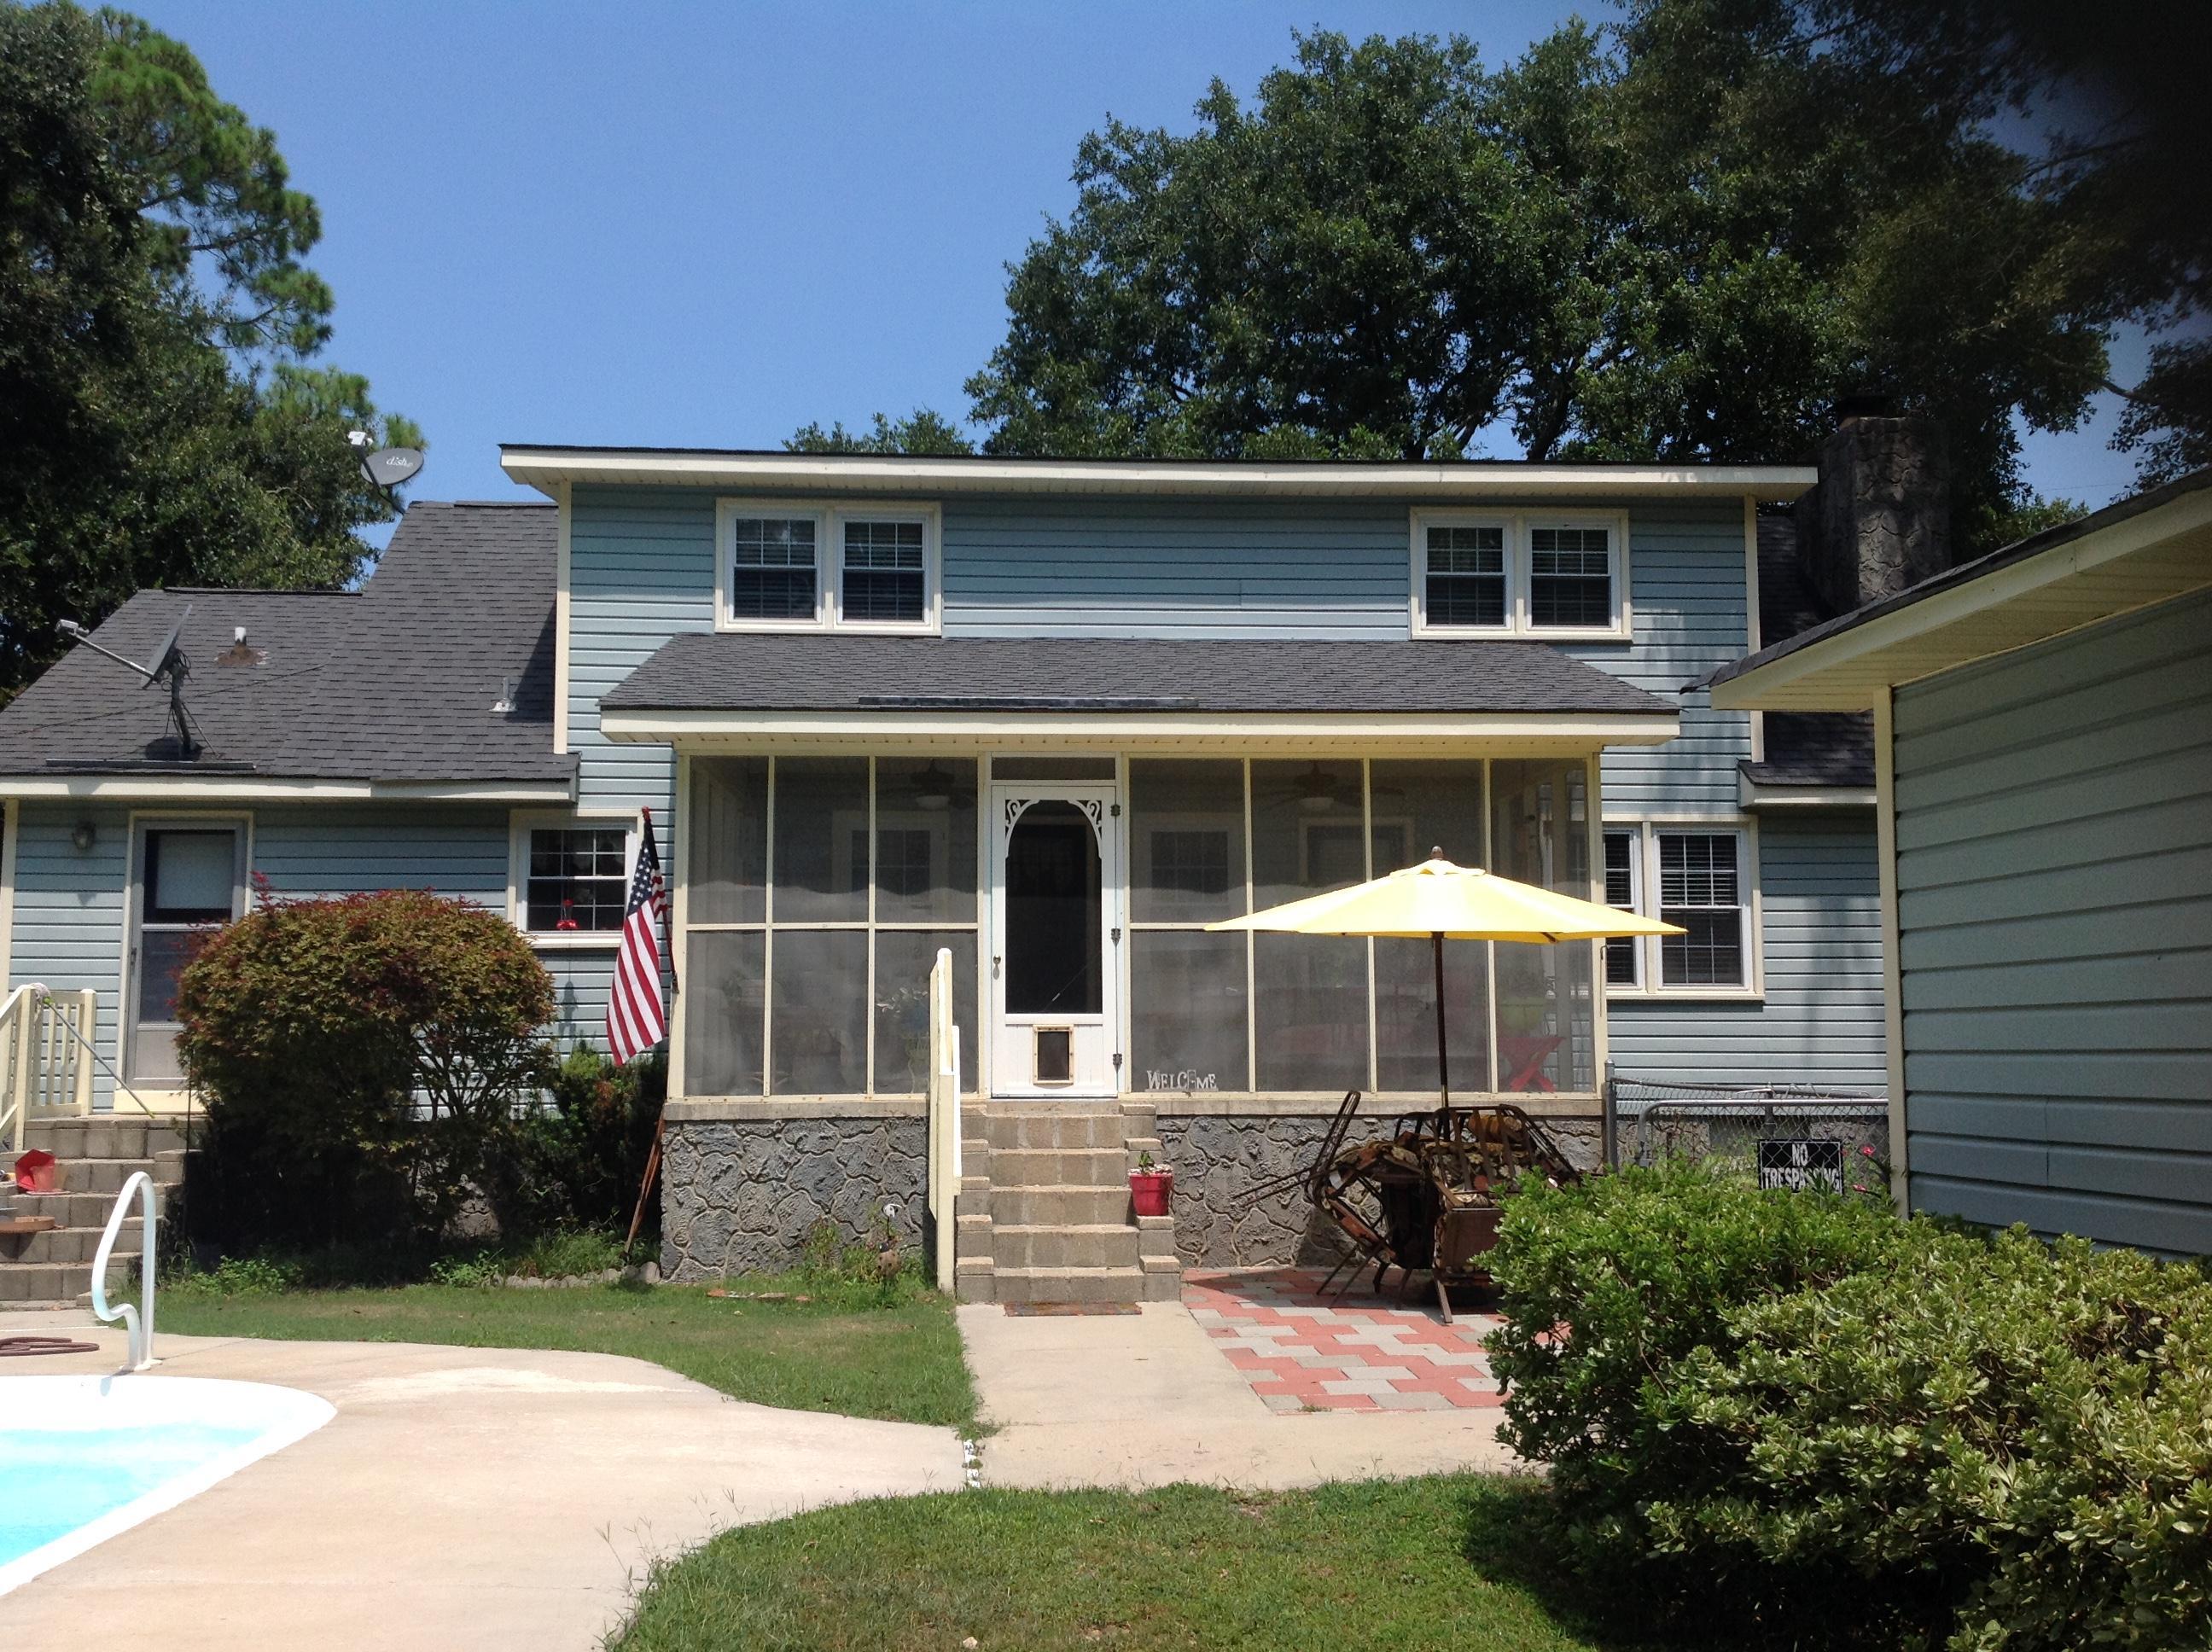 Belvedere II Homes For Sale - 122 Dogwood, Eutawville, SC - 34